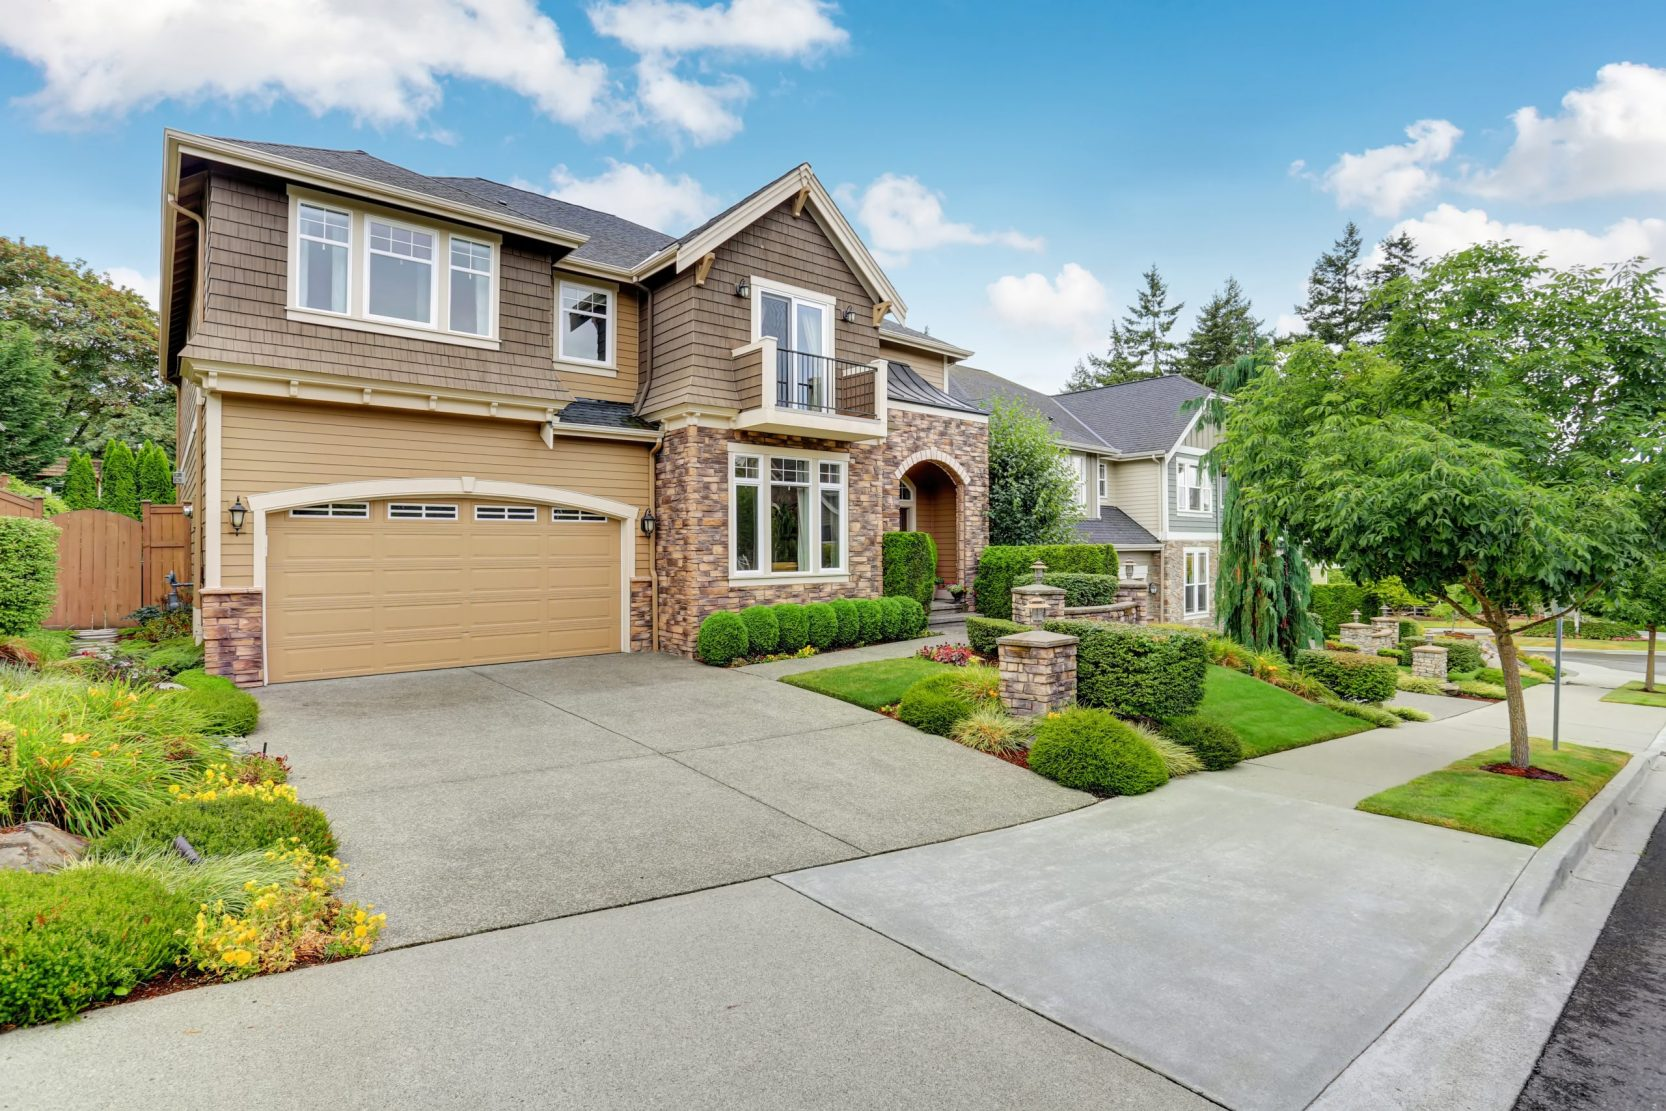 San Bernardino Home Inspections